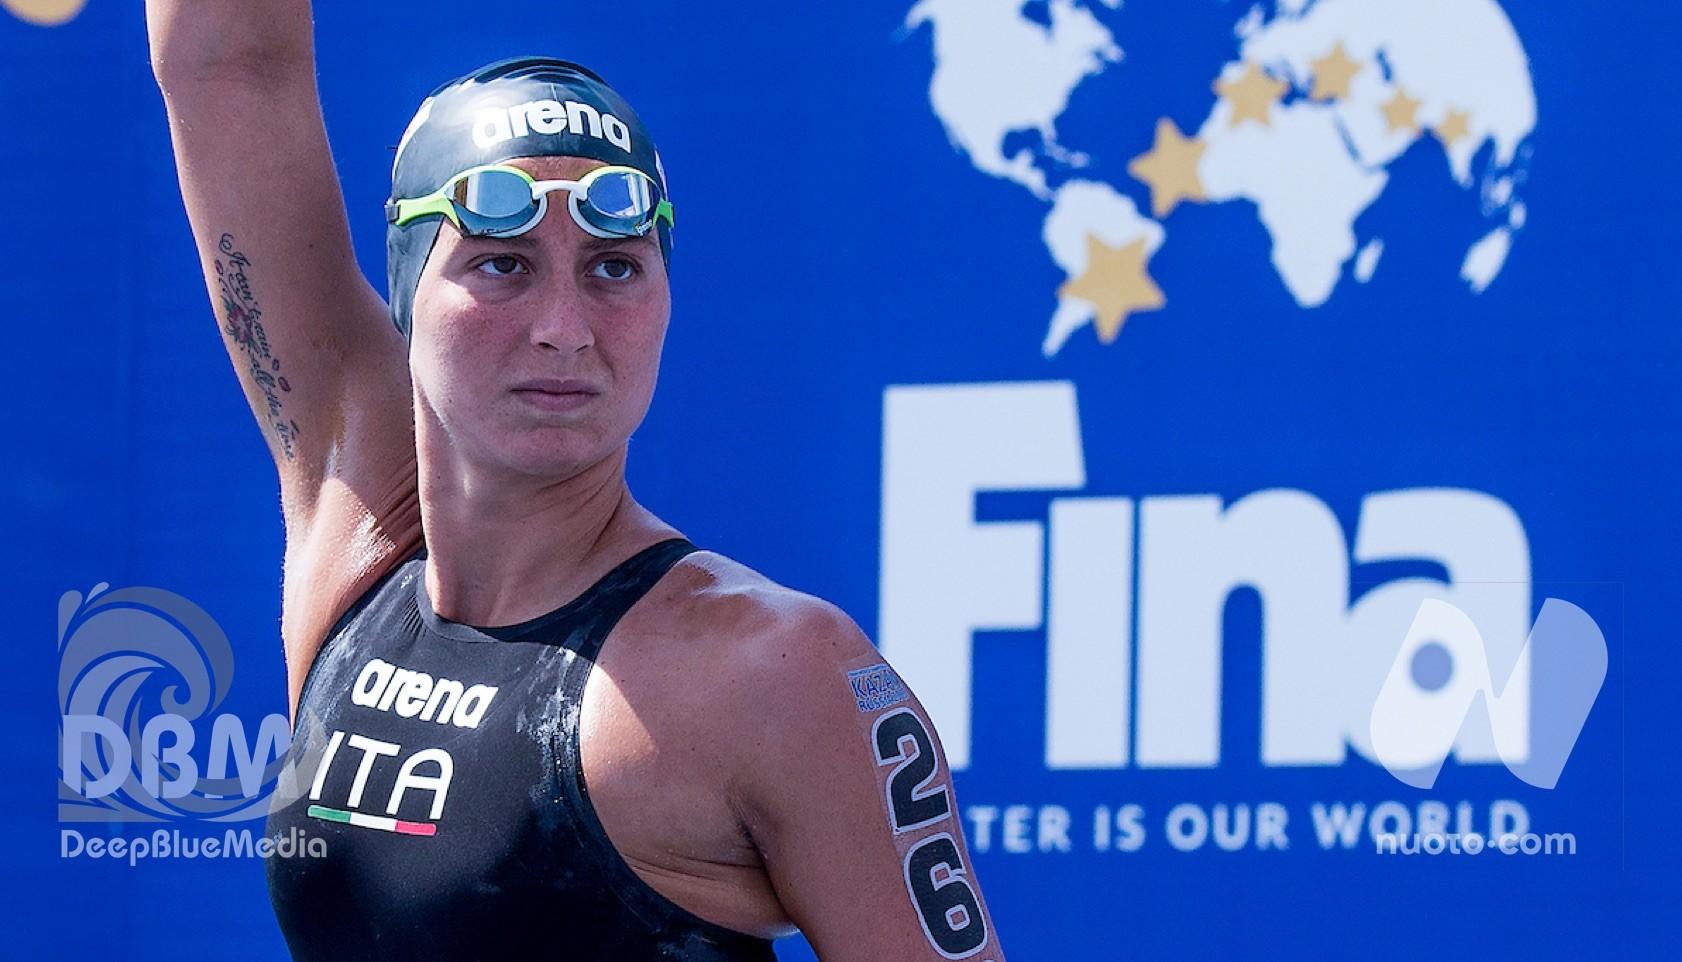 2.5Km donne – Vince Kirpichnikova, Bruni prima delle italiane